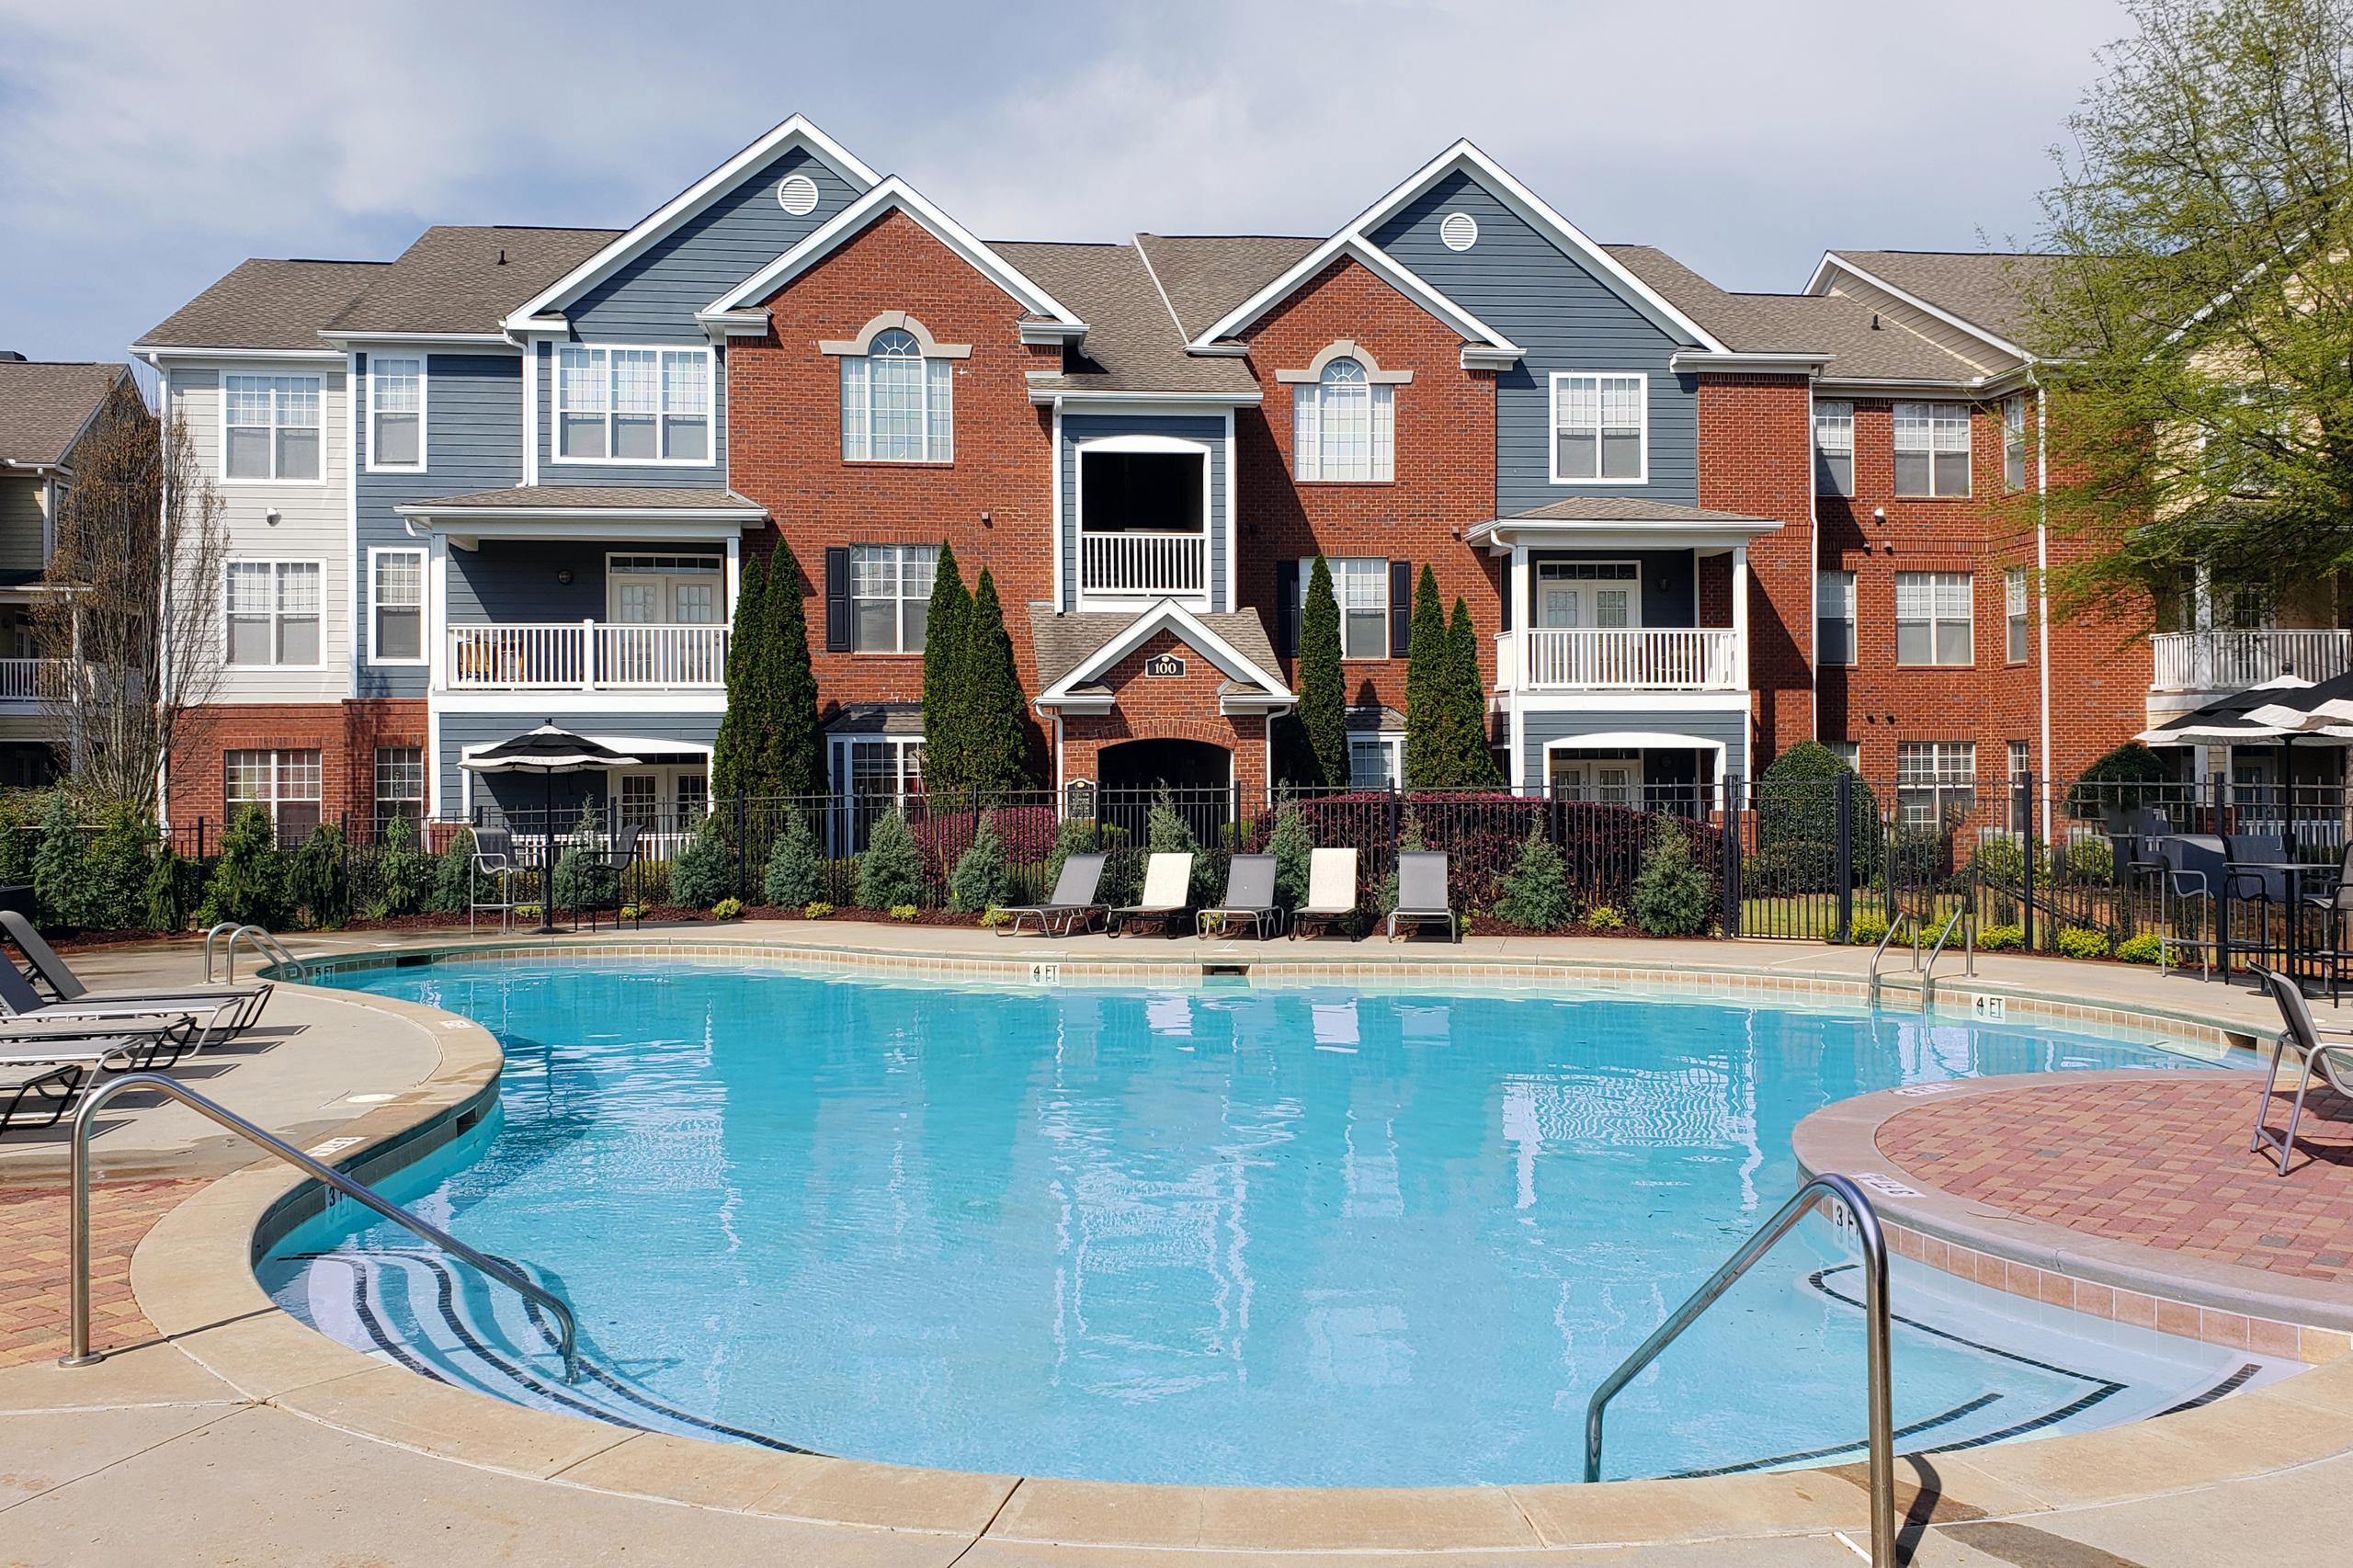 Awe Inspiring Apartments In Mcdonough Ga For Rent Woodlawn Park Apartments Home Interior And Landscaping Eliaenasavecom